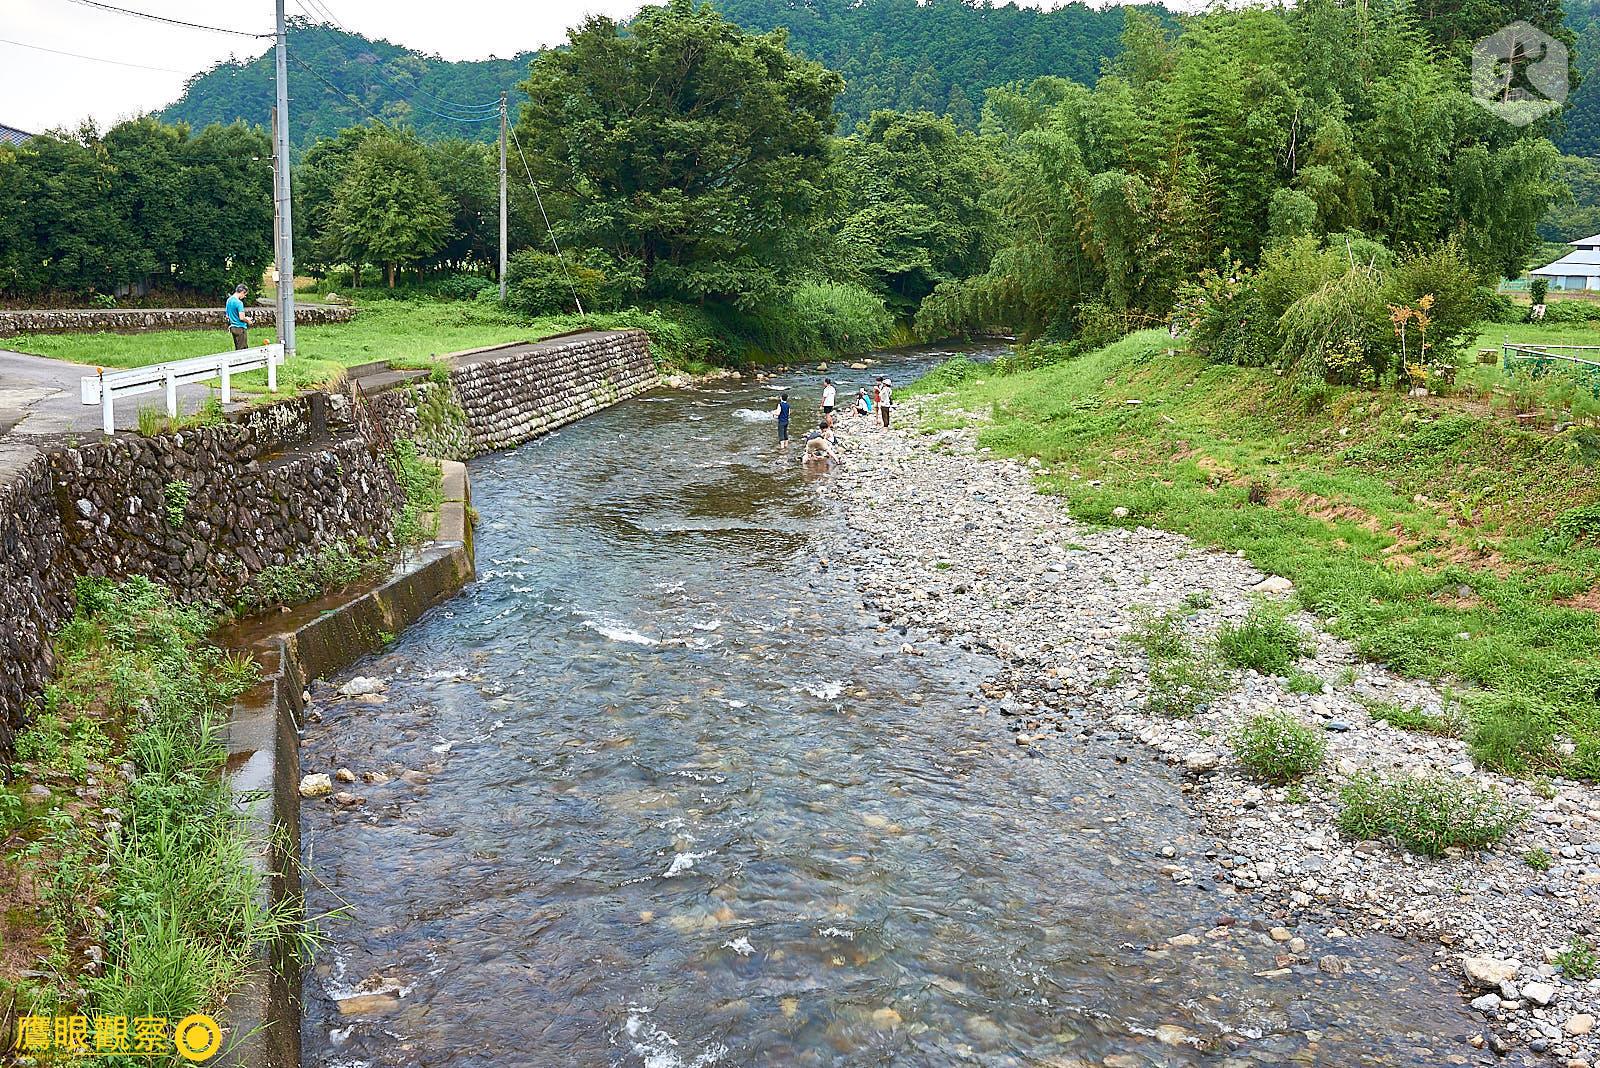 Japan Travel River Stream 20190817153450 日本廢棄小學 🚗 RV 休旅車露營、森林探險之旅(櫪木縣鹿沼市立久我小學)🇯🇵⛺️